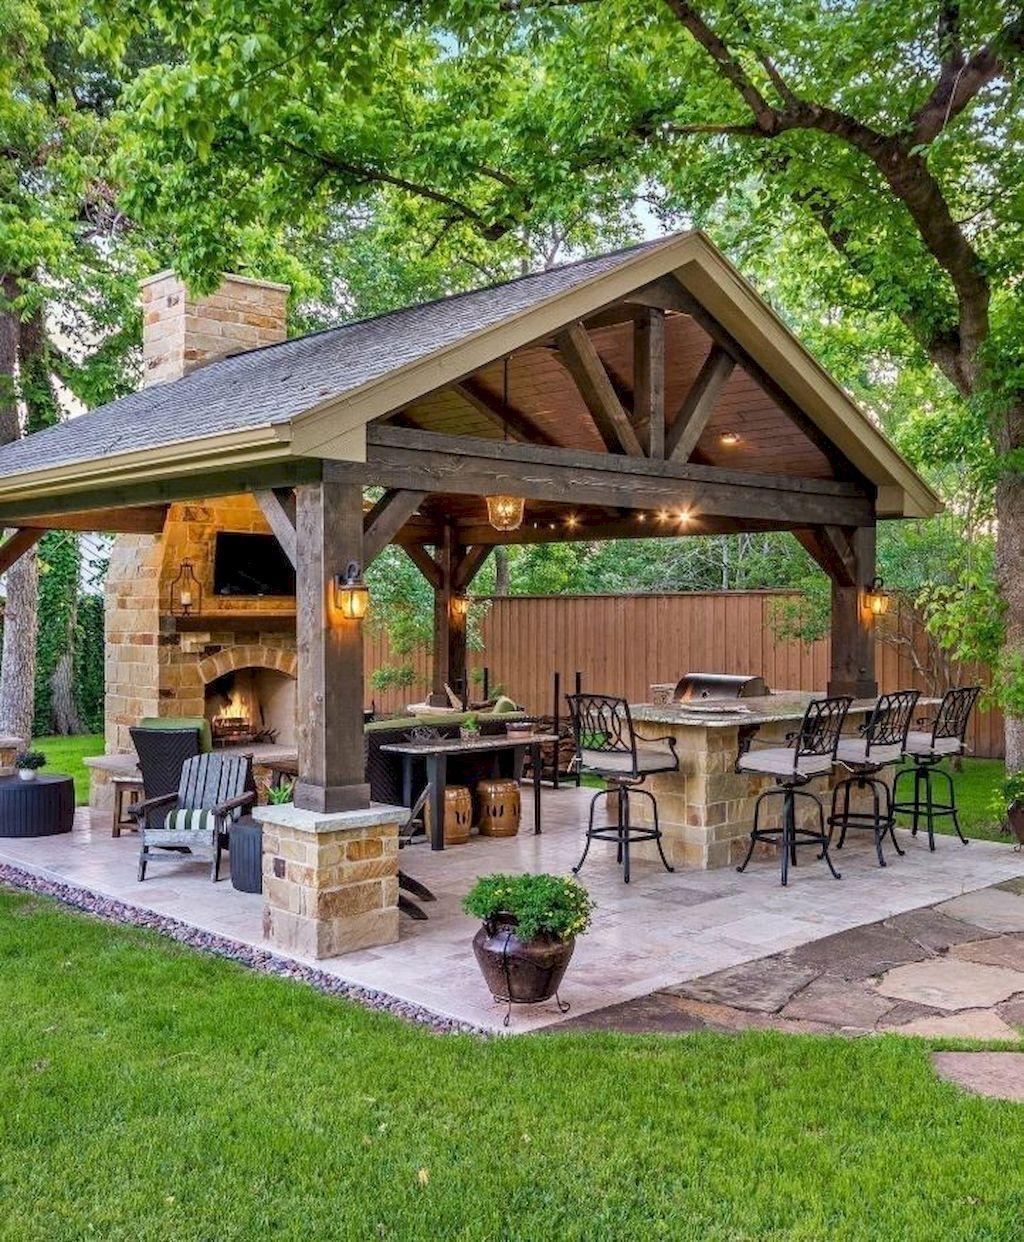 Photo of 85 Incredible Outdoor Kitchen Design Ideas for Summer – Homekover